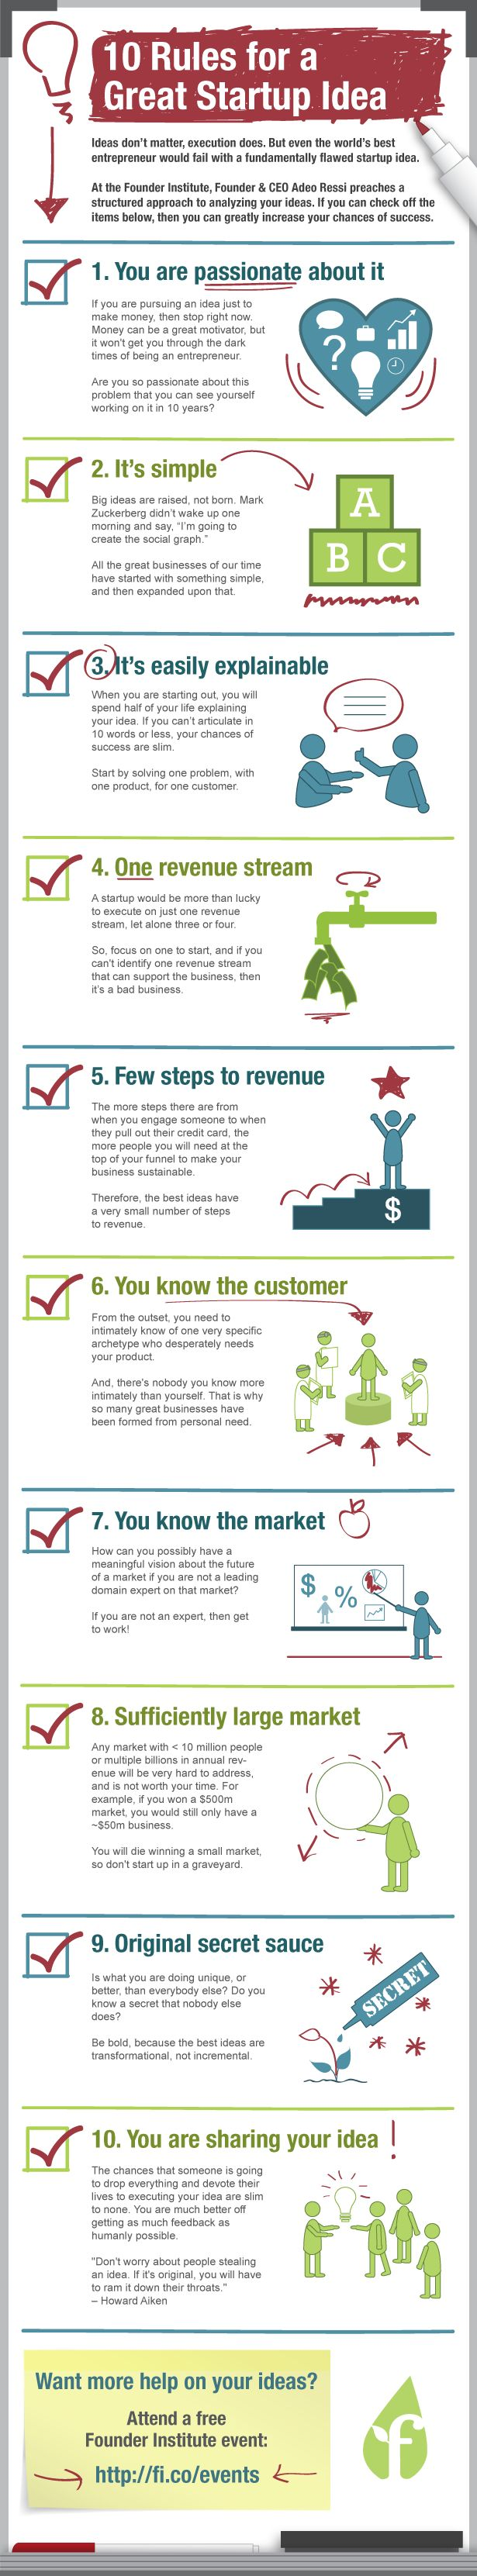 10 trucos para mejorar tu idea de negocio #Emprendedores #Entrepreneurs